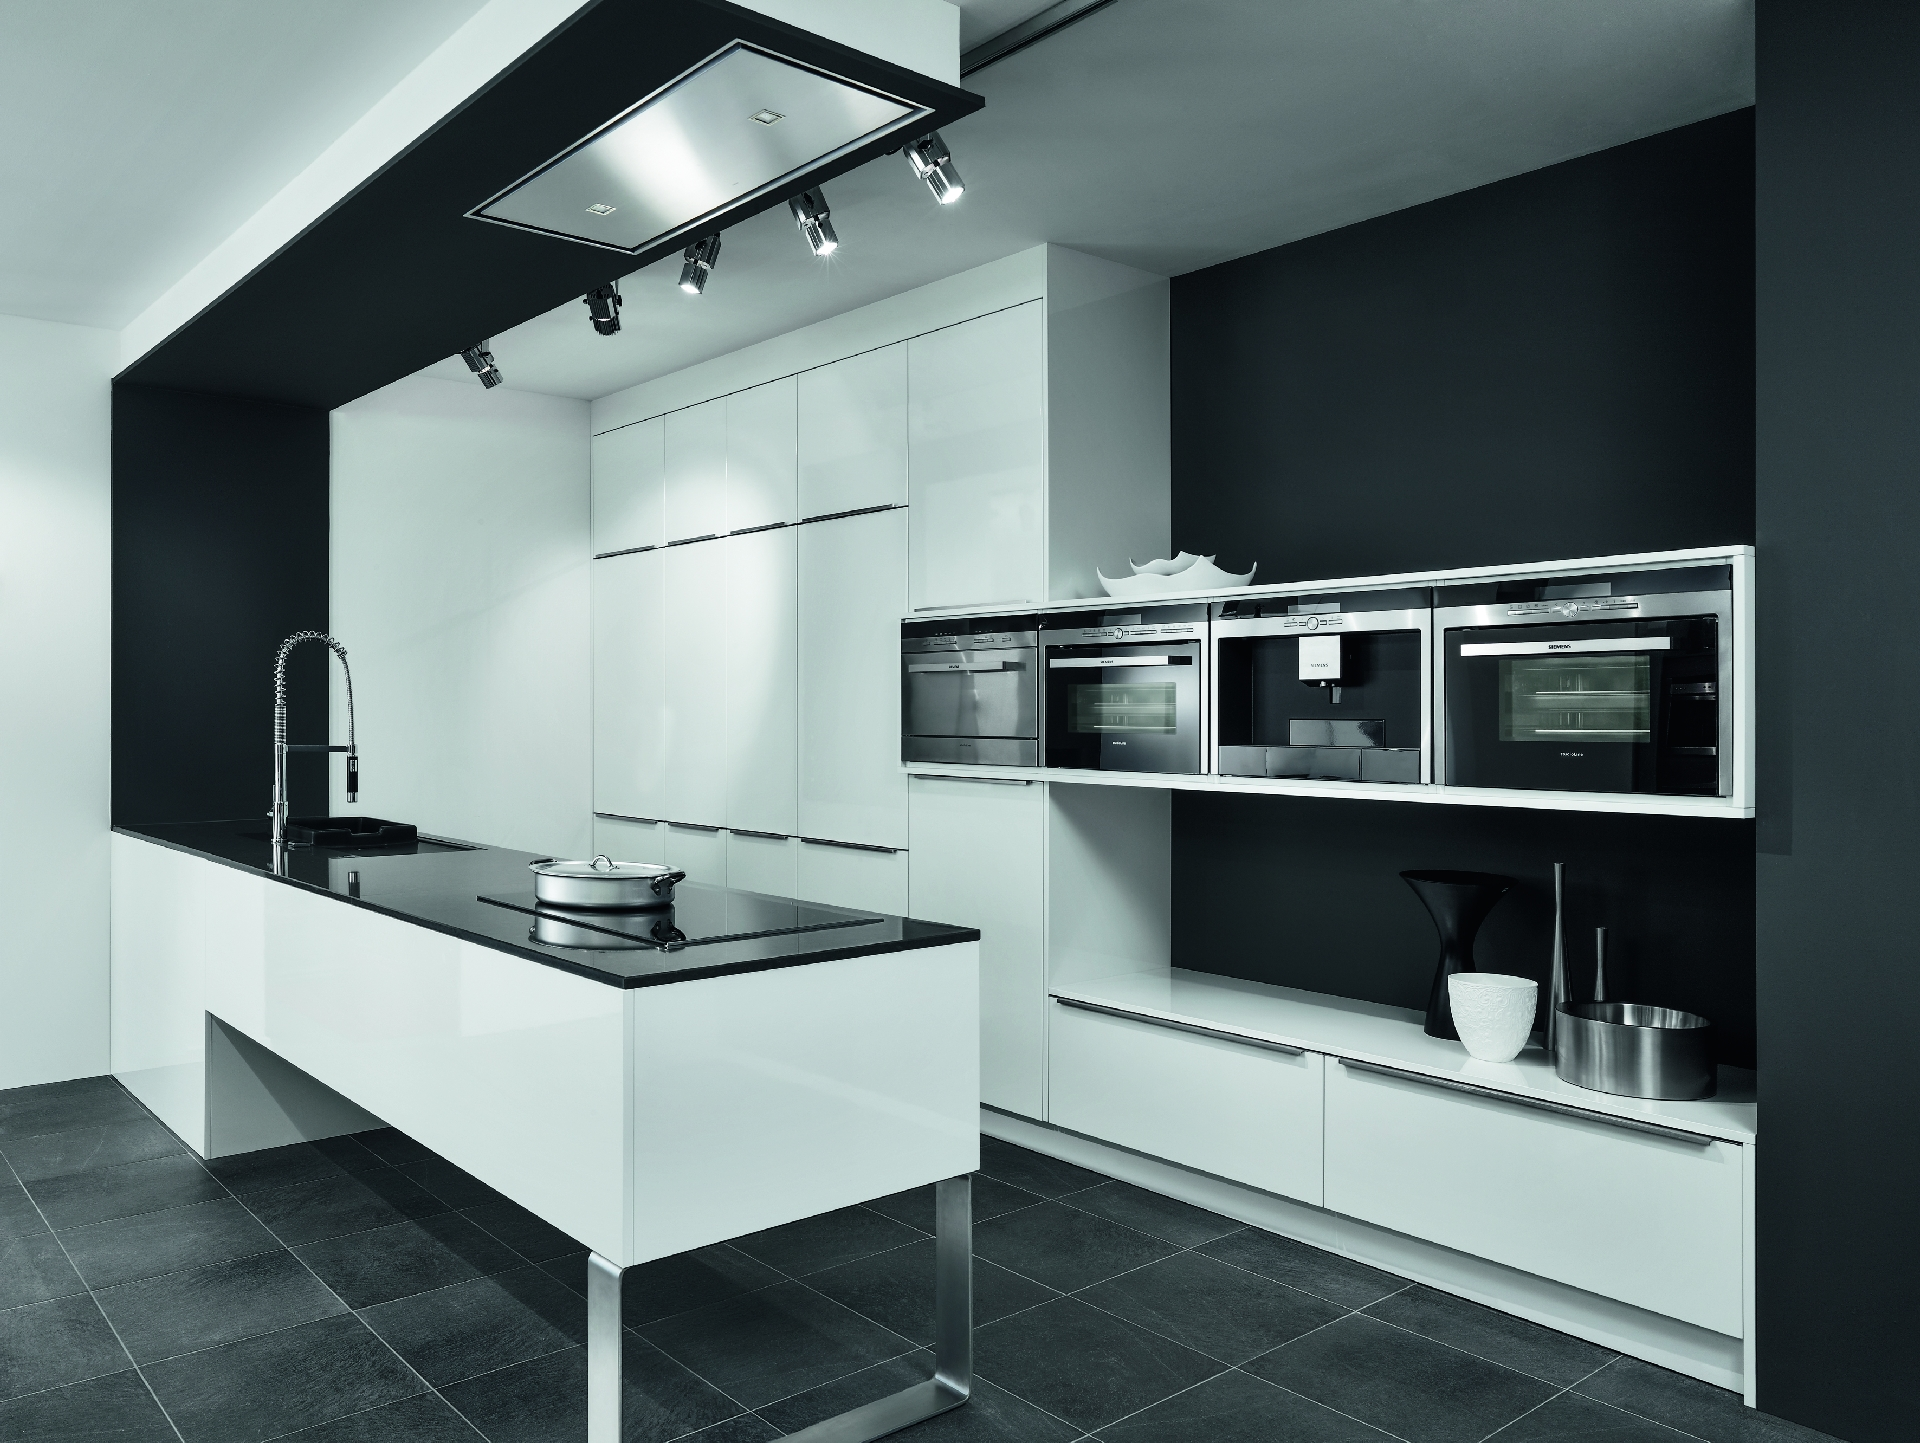 A15 keukenstudio de moderne keuken for Moderne keuken